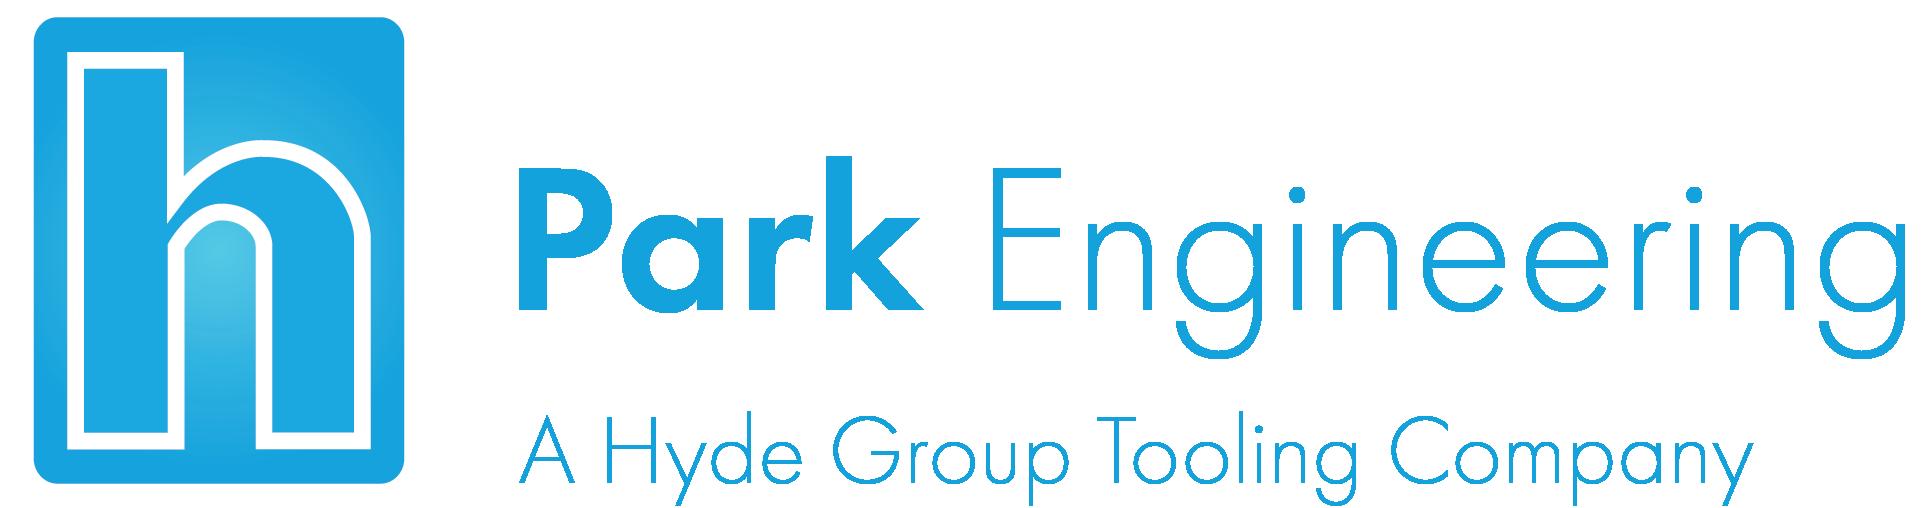 Park Engineering Logo.png